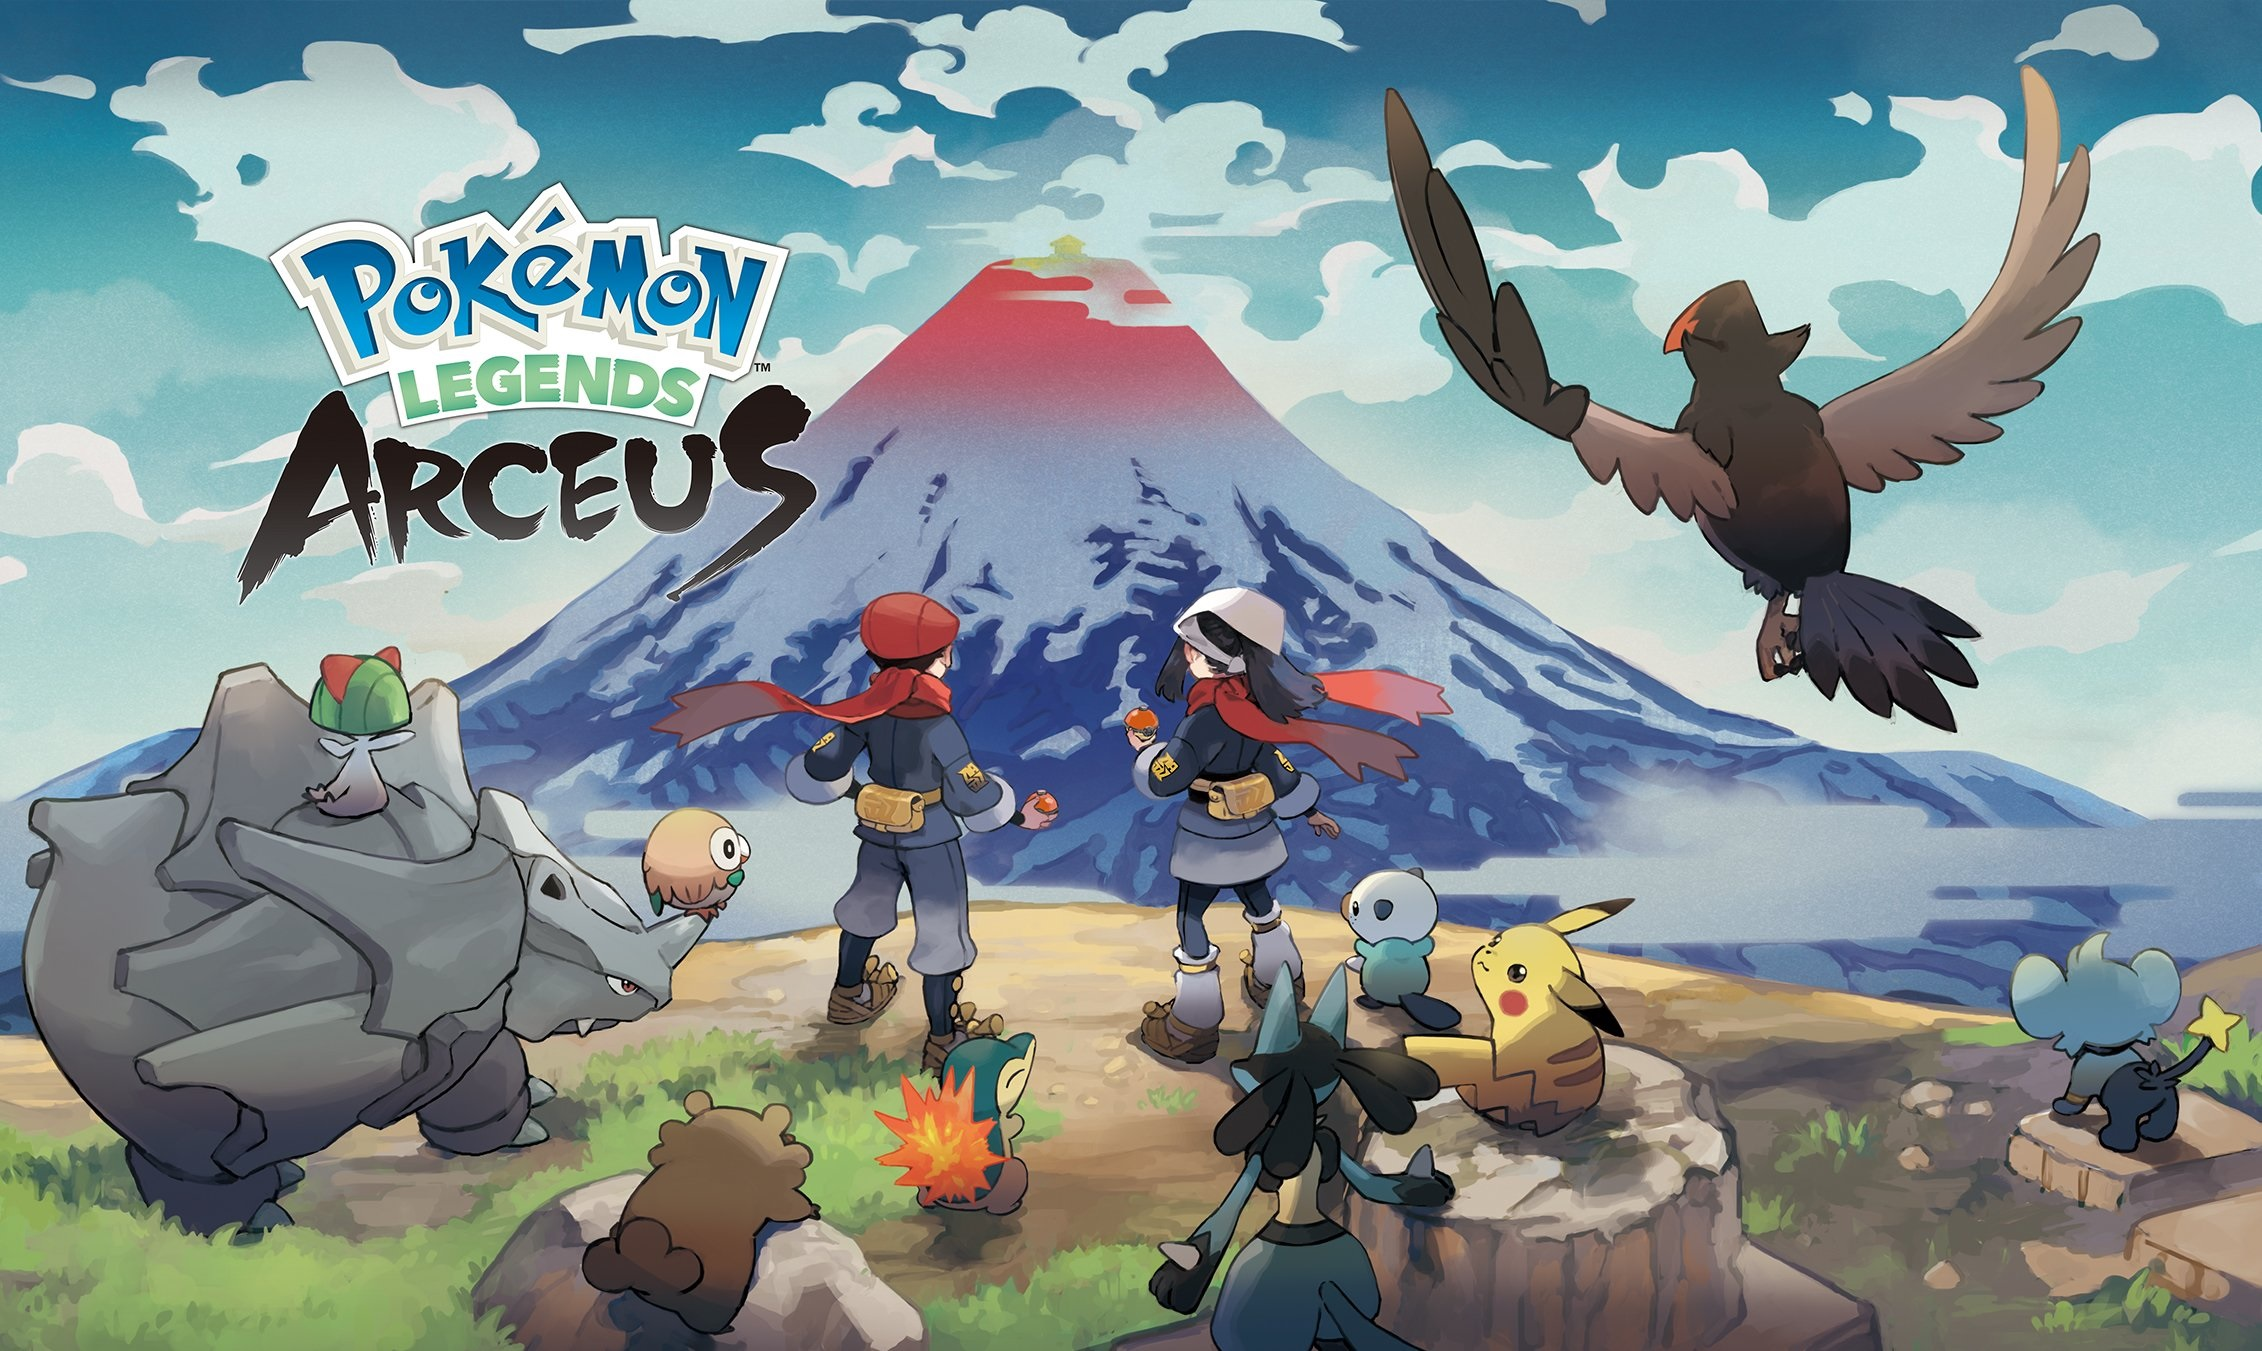 Pokemon Legends: Arceus will turn back the clock January 28, 2022 screenshot